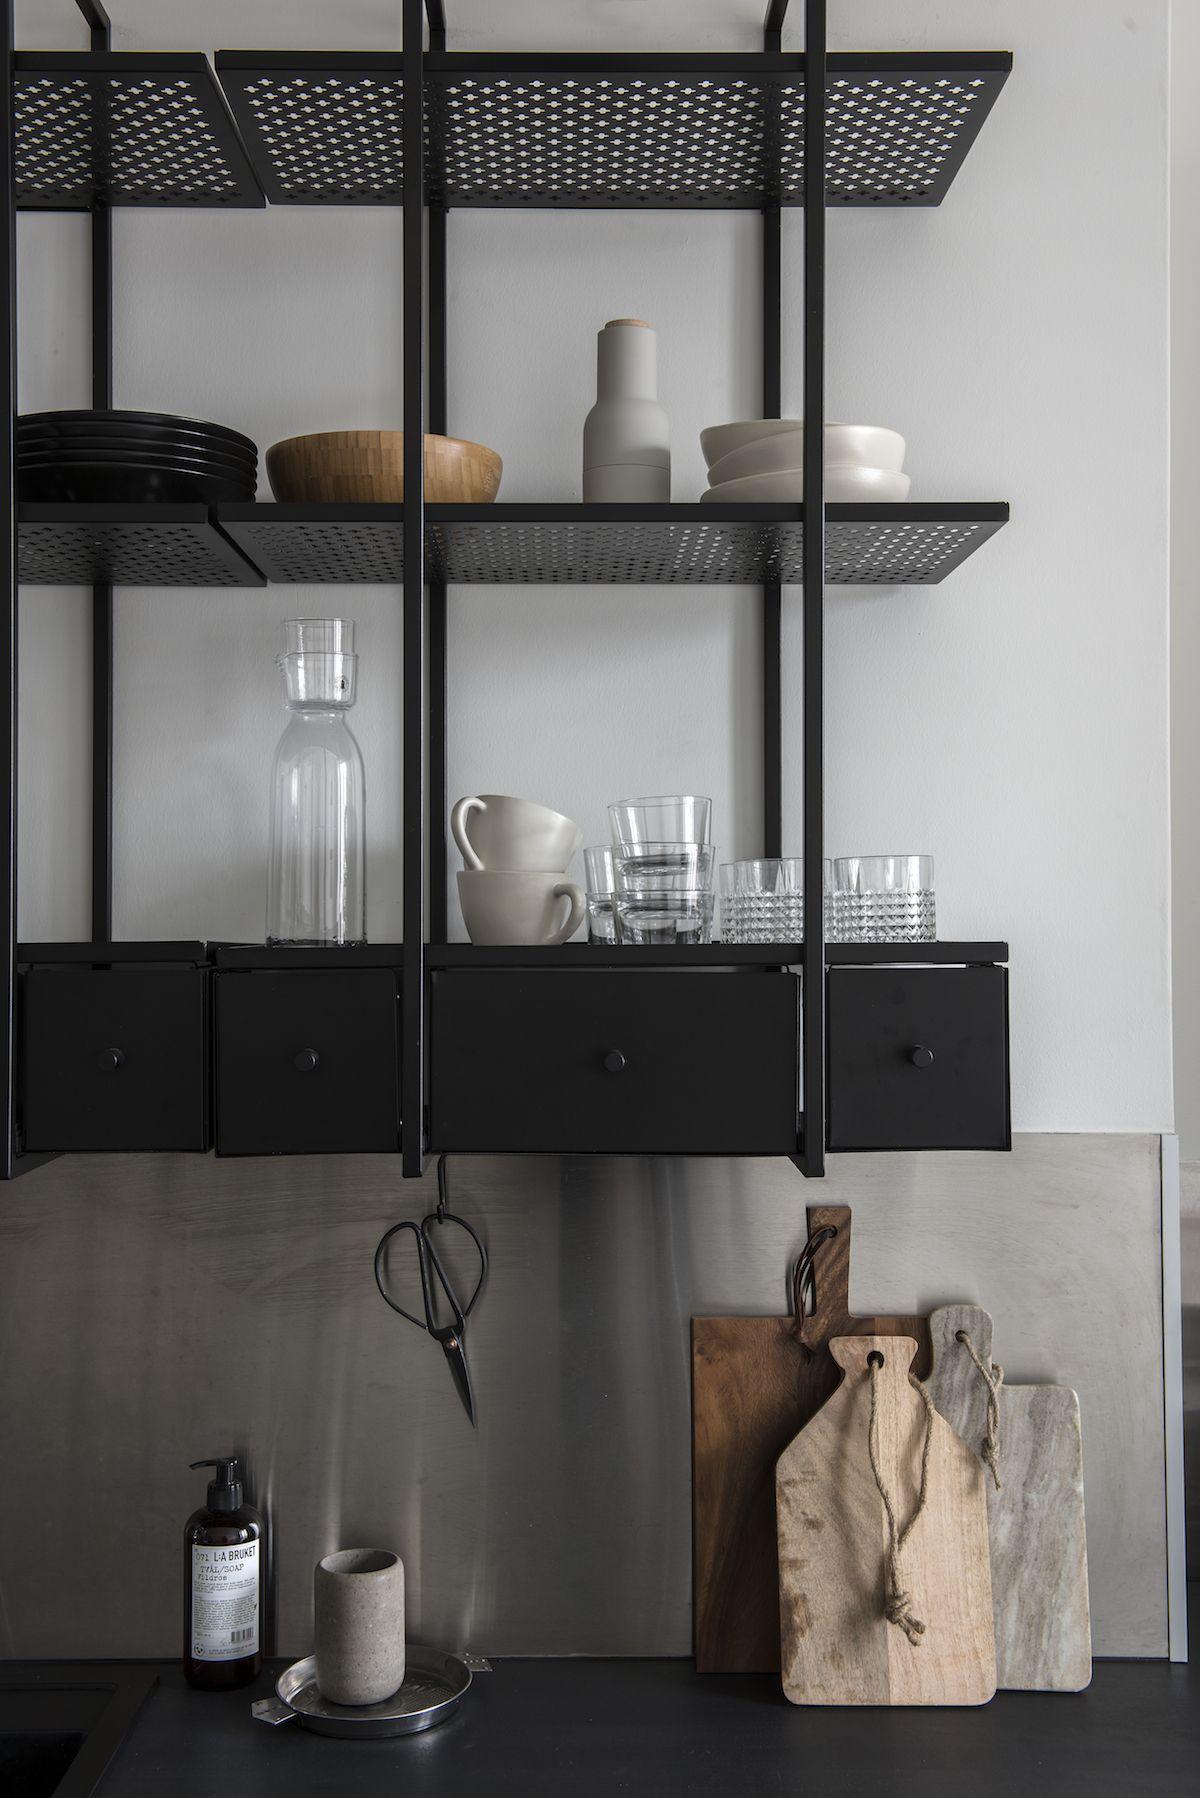 metal kitchen shelves rustic black cabinets interior design photos gallery